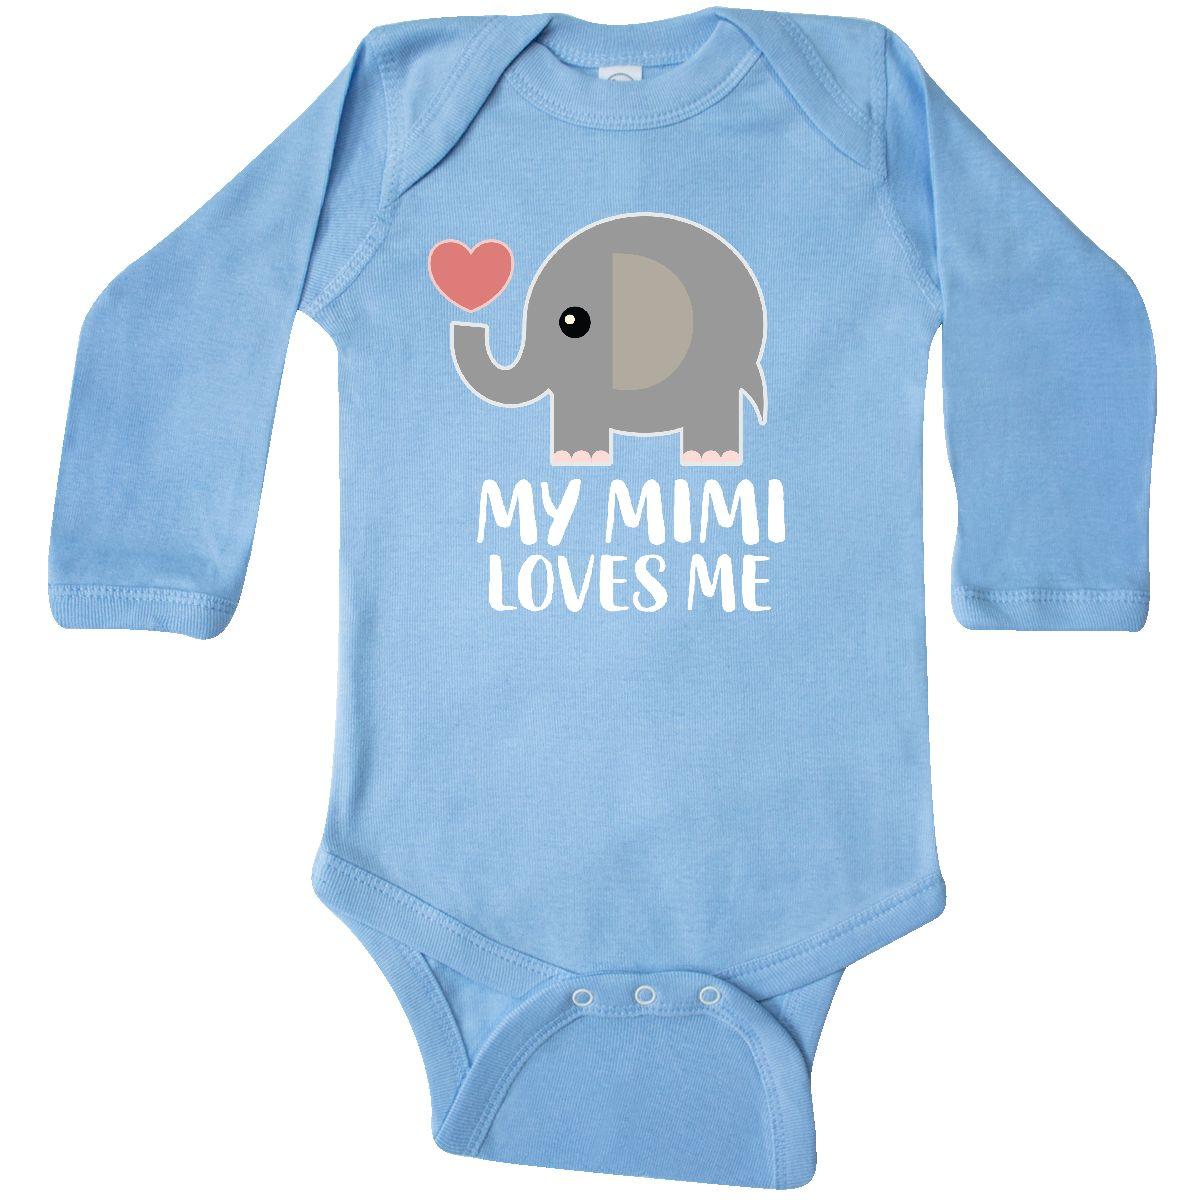 Inktastic-My-Mimi-Loves-Me-Grandchild-Gift-Long-Sleeve-Bodysuit-From-Grandson